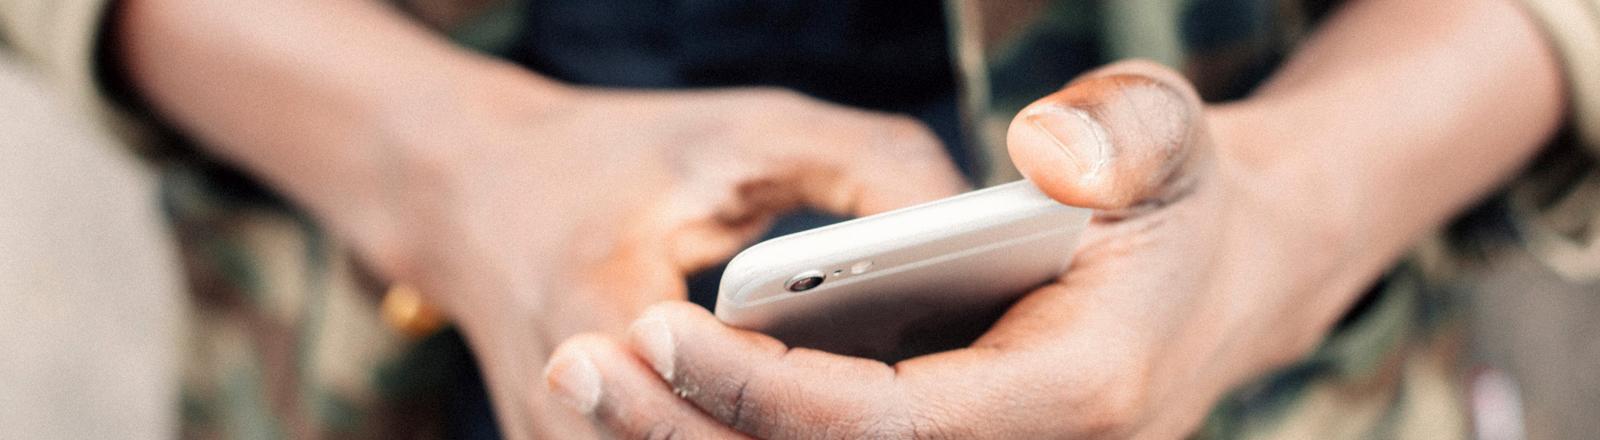 Daumen wischt über Smartphone